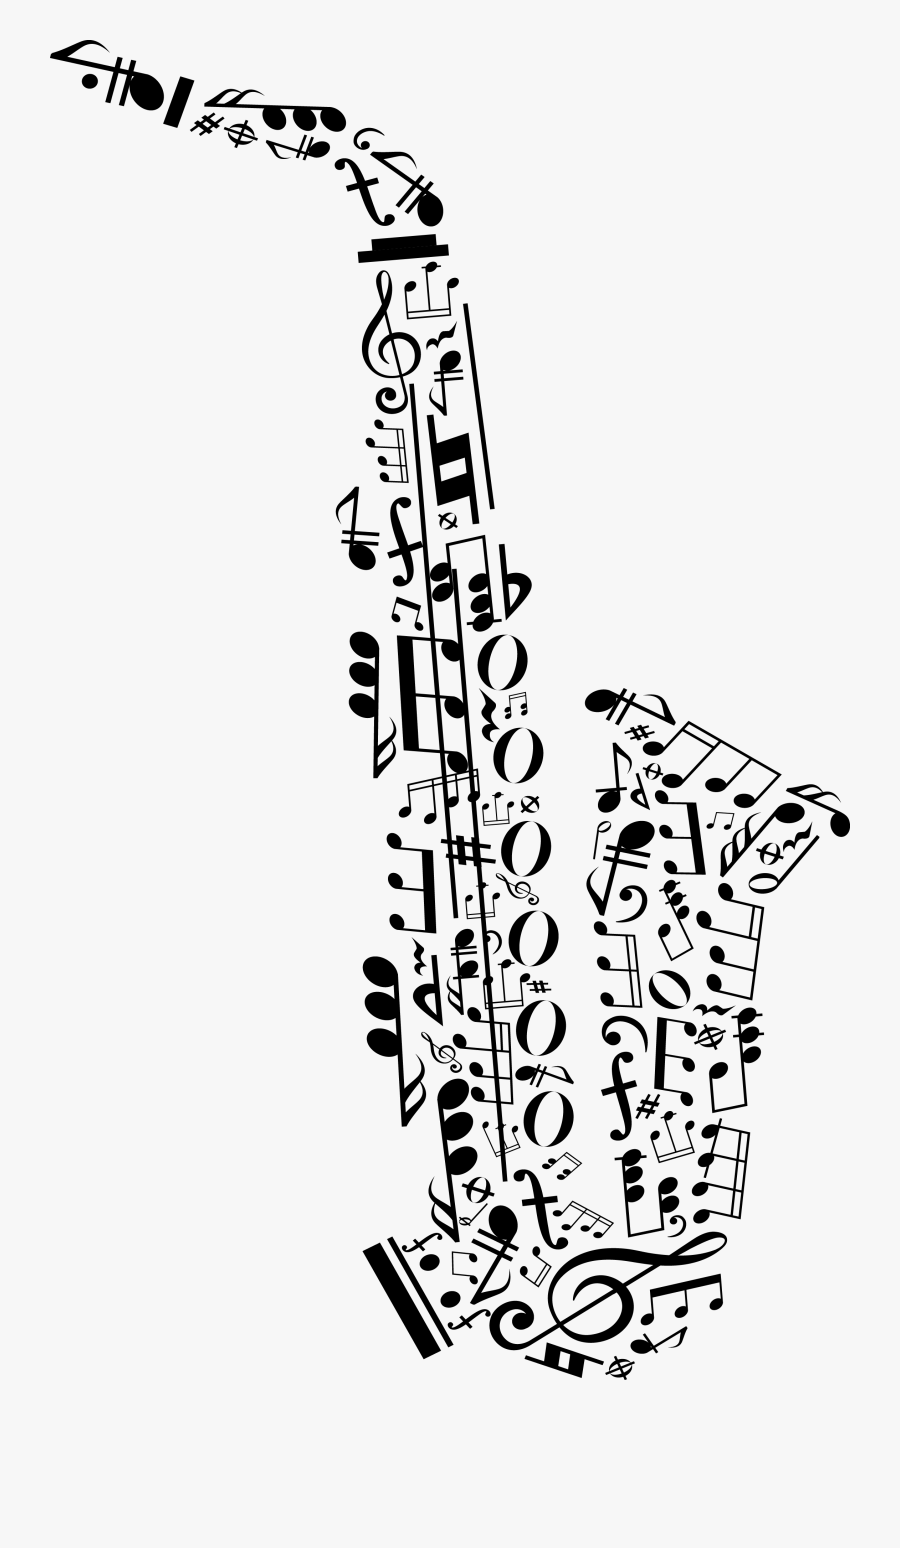 Transparent Music Notes Clip Art Png - Saxophone Made Of Music Notes, Transparent Clipart